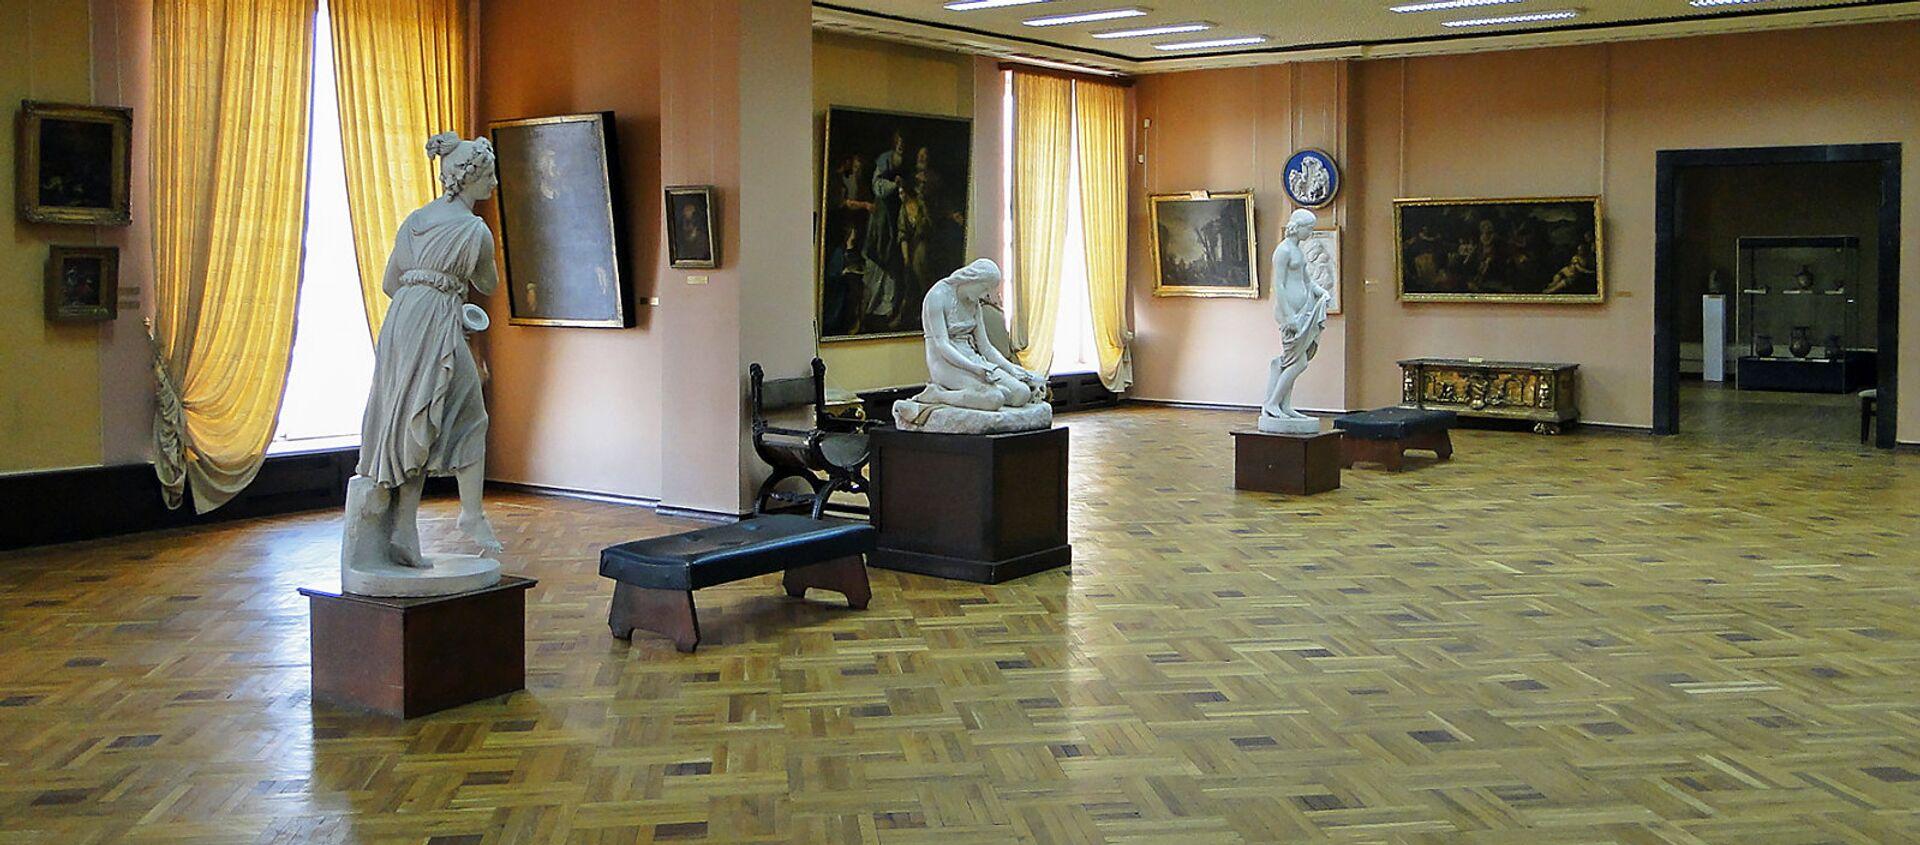 Картинная галерея - Sputnik Արմենիա, 1920, 08.02.2021